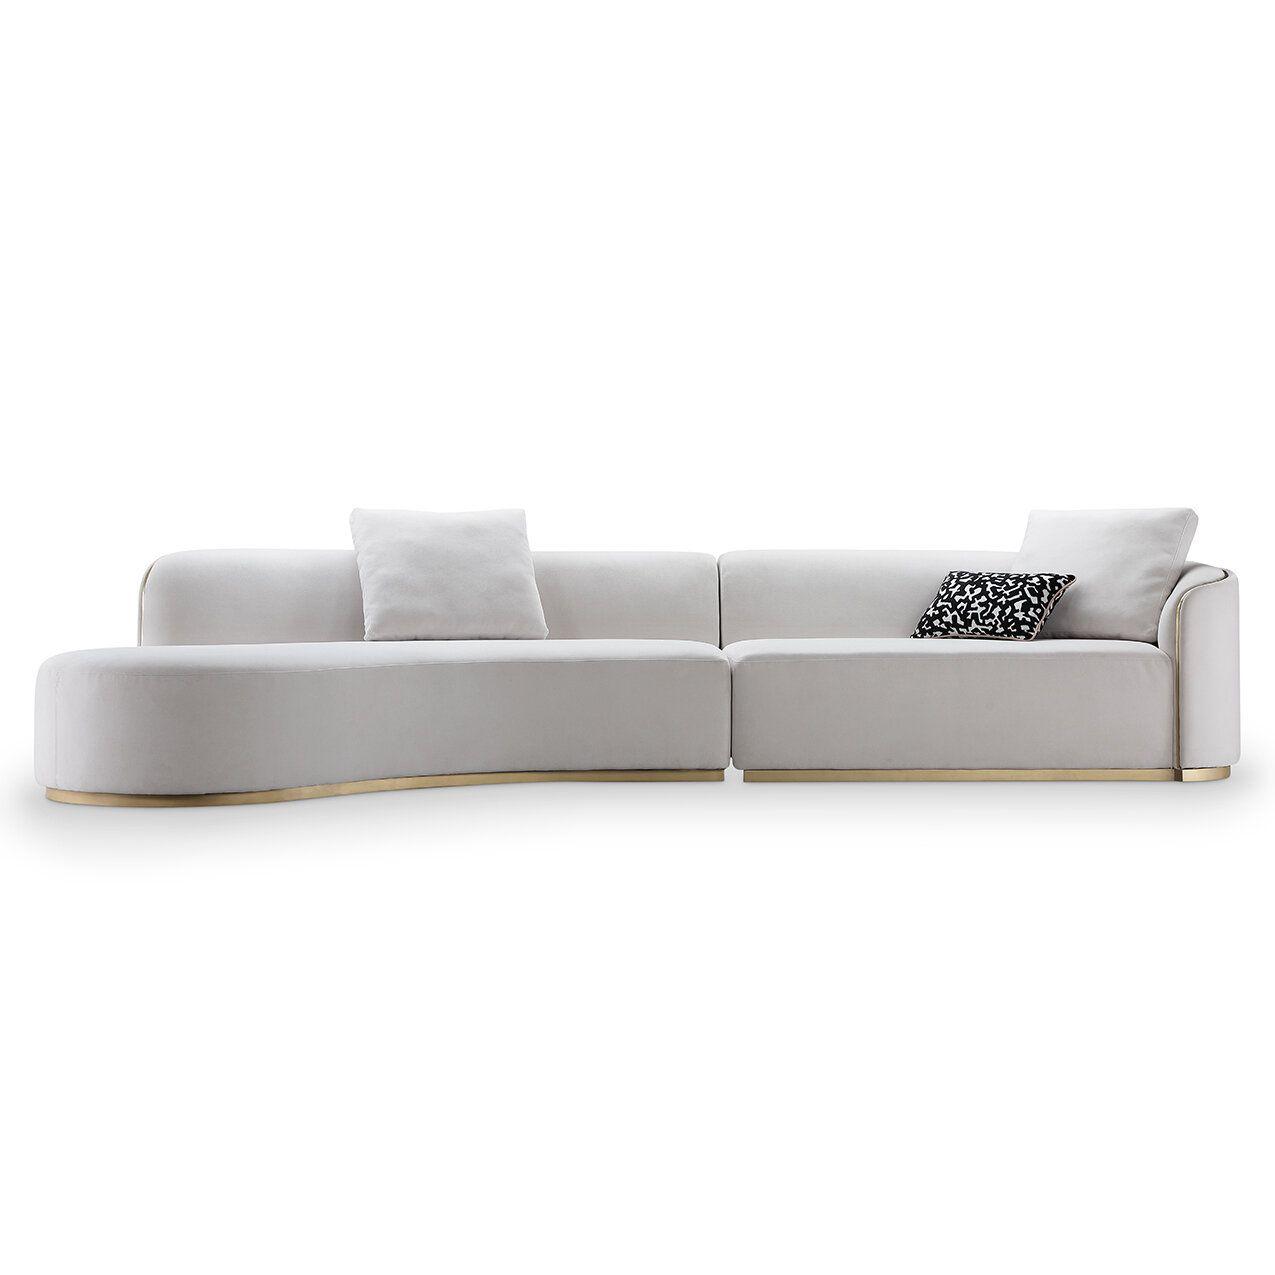 Ammeth Sofa Olivya Stone In 2020 Sofa Nyc Interior Design Sofa Furniture